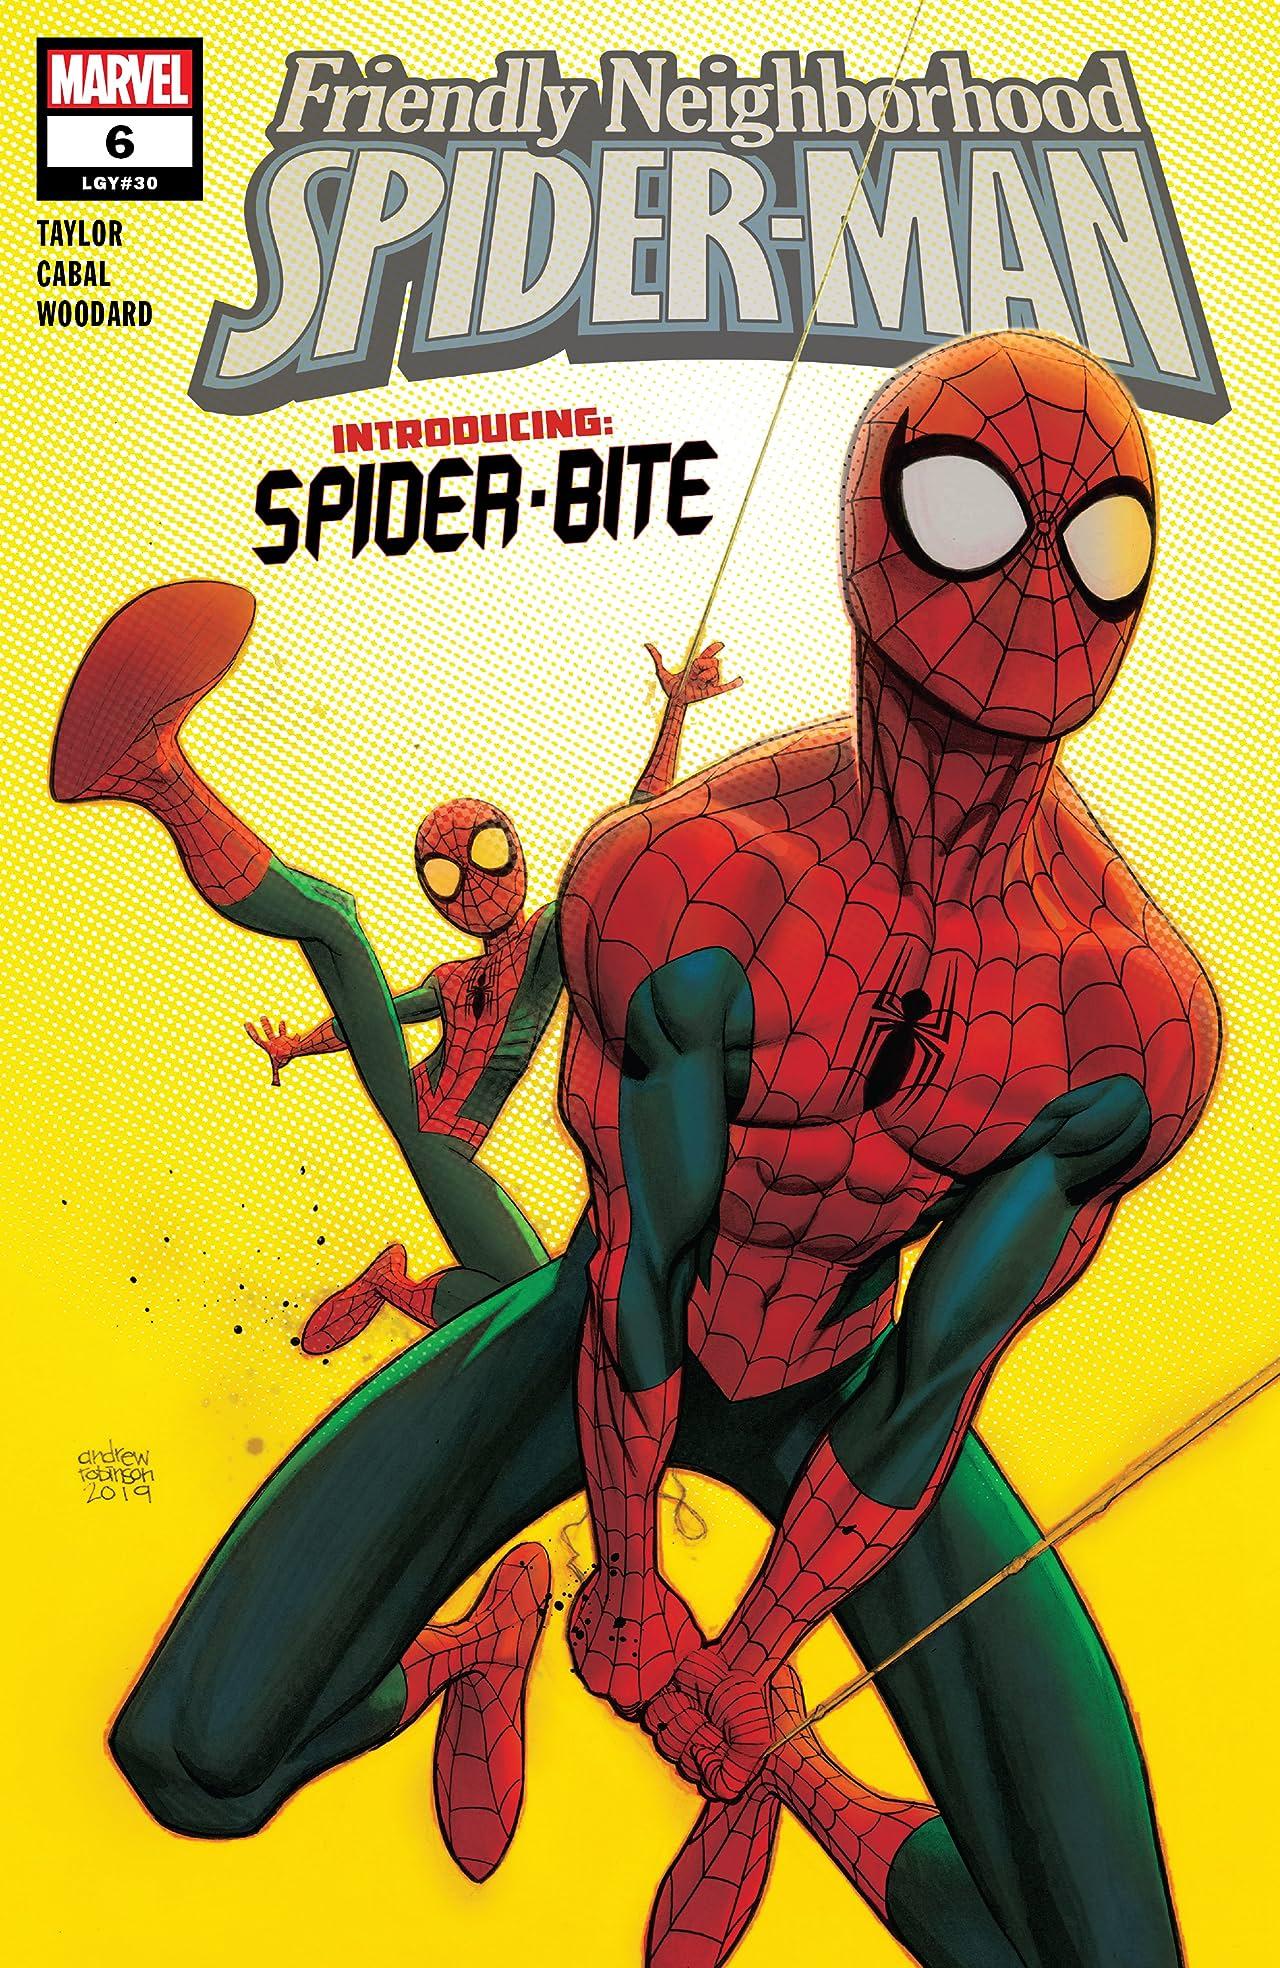 Friendly Neighborhood Spider-Man (2019) #6